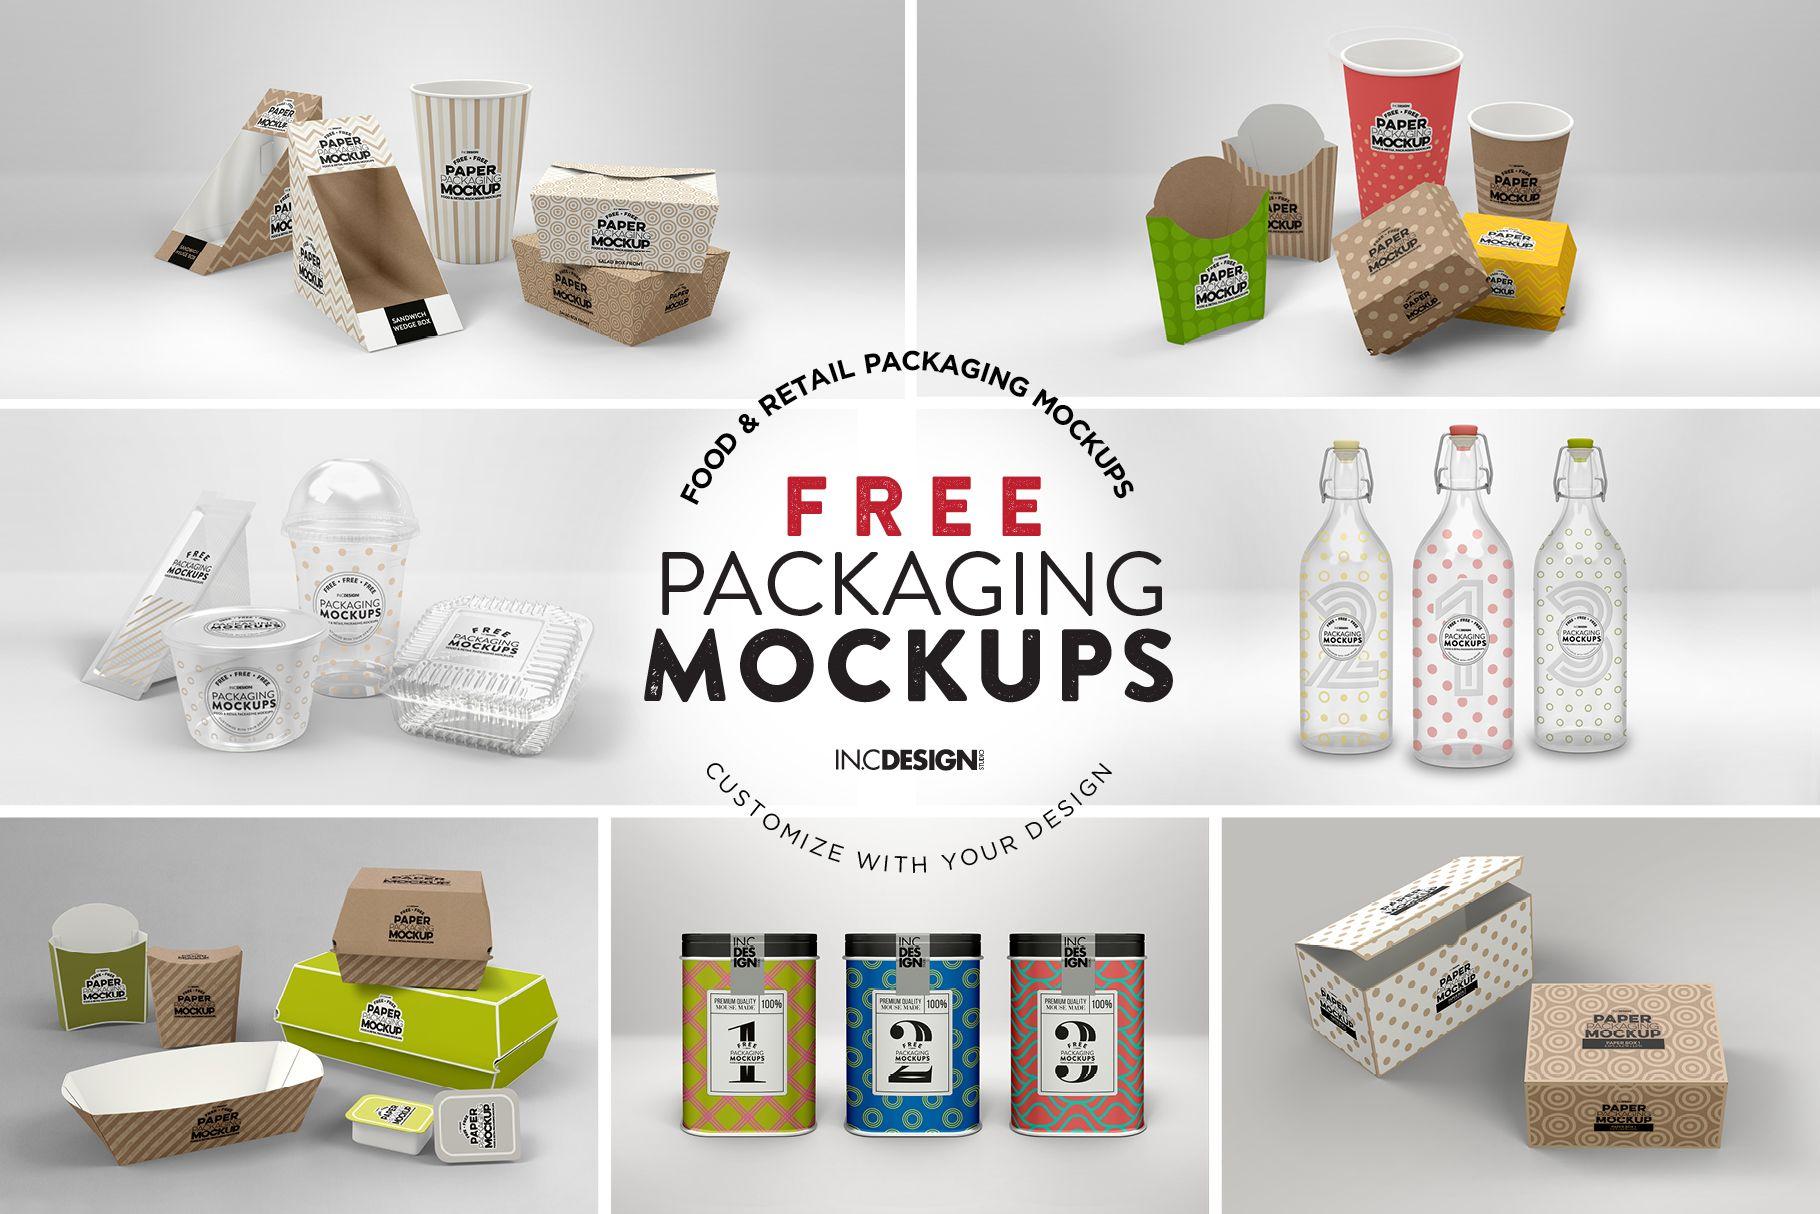 Download Bundle Paper Packaging Mockup Packaging Mockup Packaging Bottle Mockup